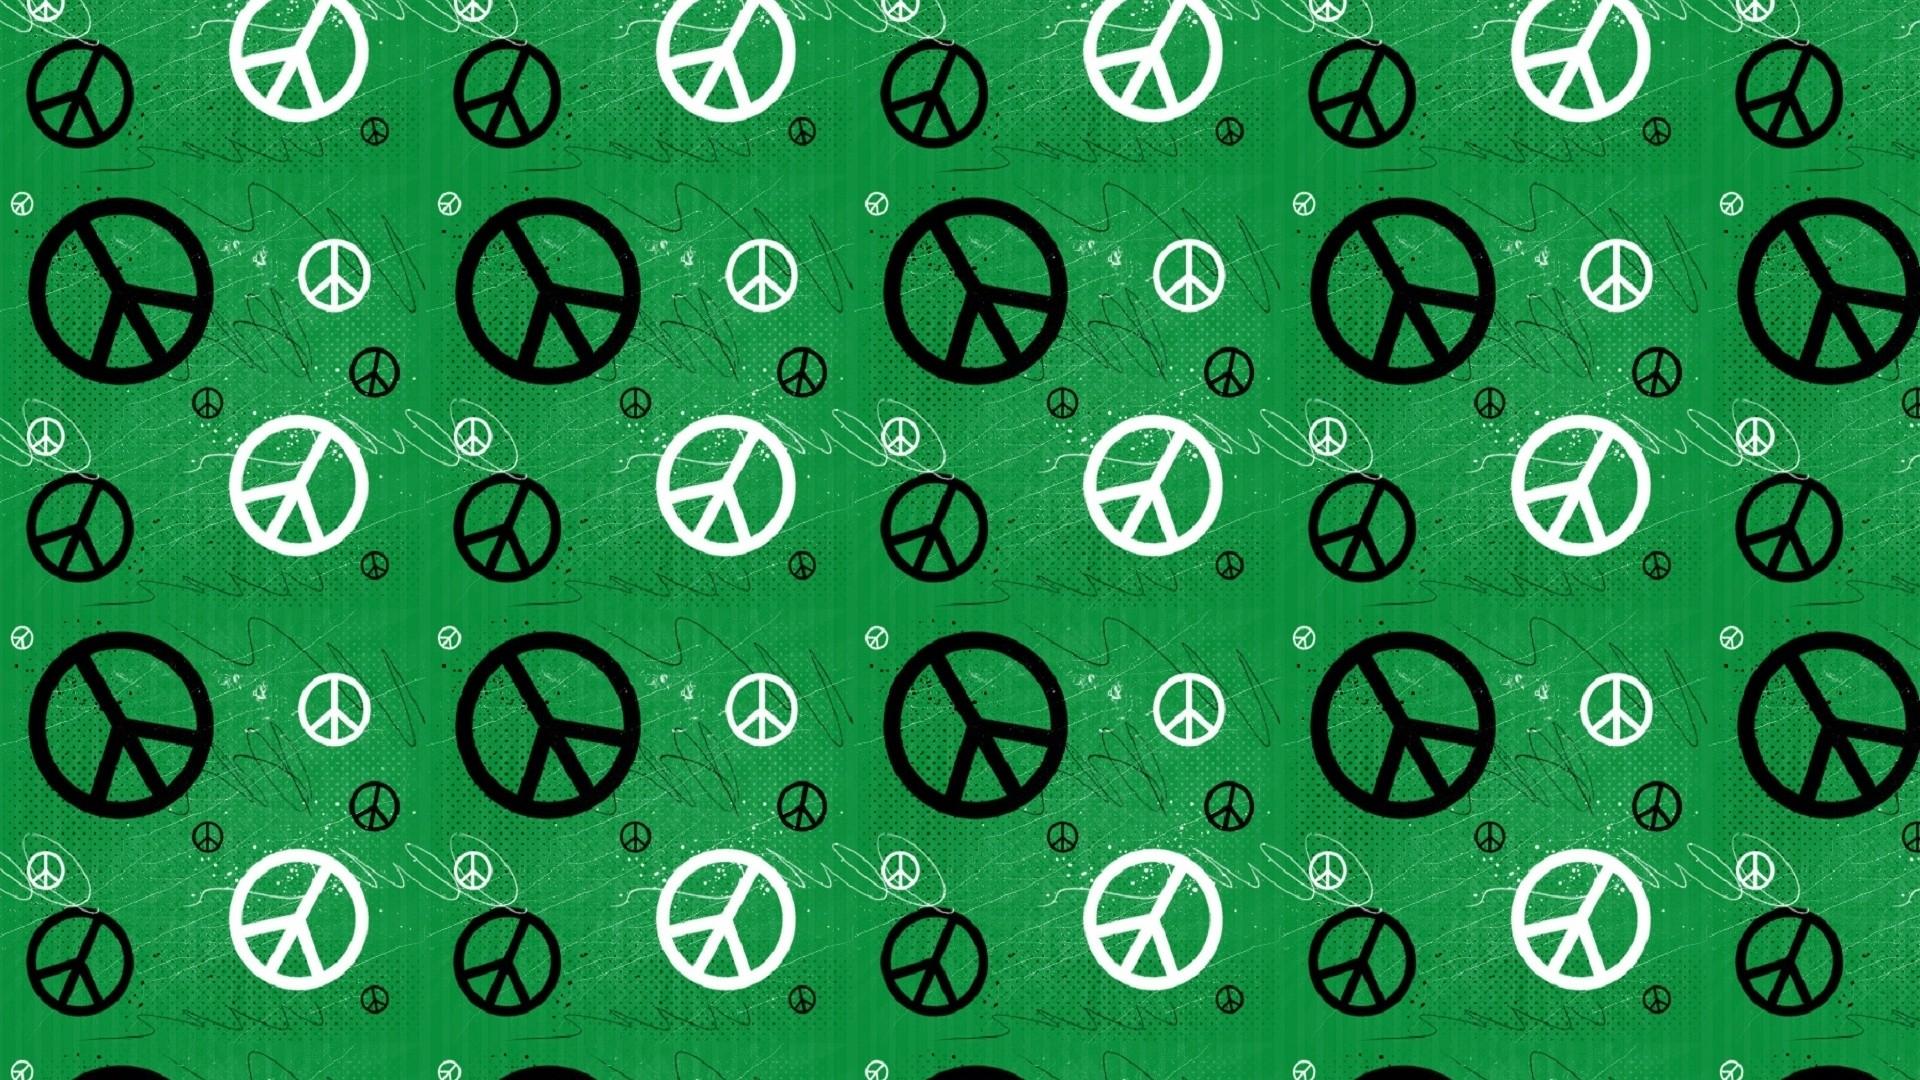 Peace Sign Desktop Wallpaper (58+ images)